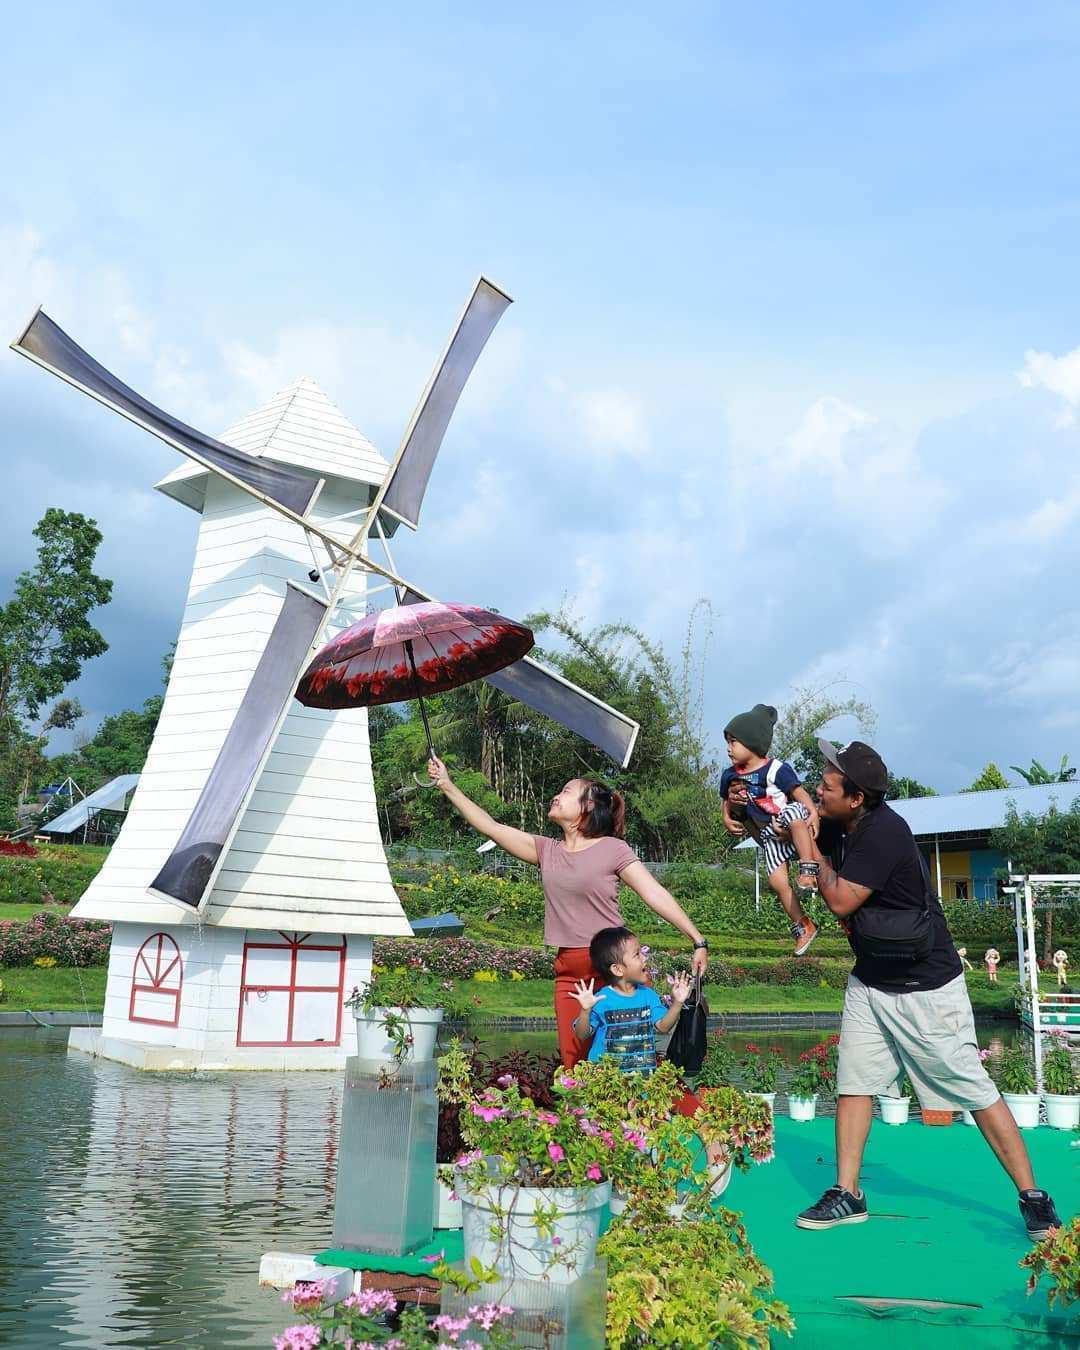 Berfoto Bersama Keluarga di Alamanda Jogja Flower Garden, Image From @eugeneephandanaru